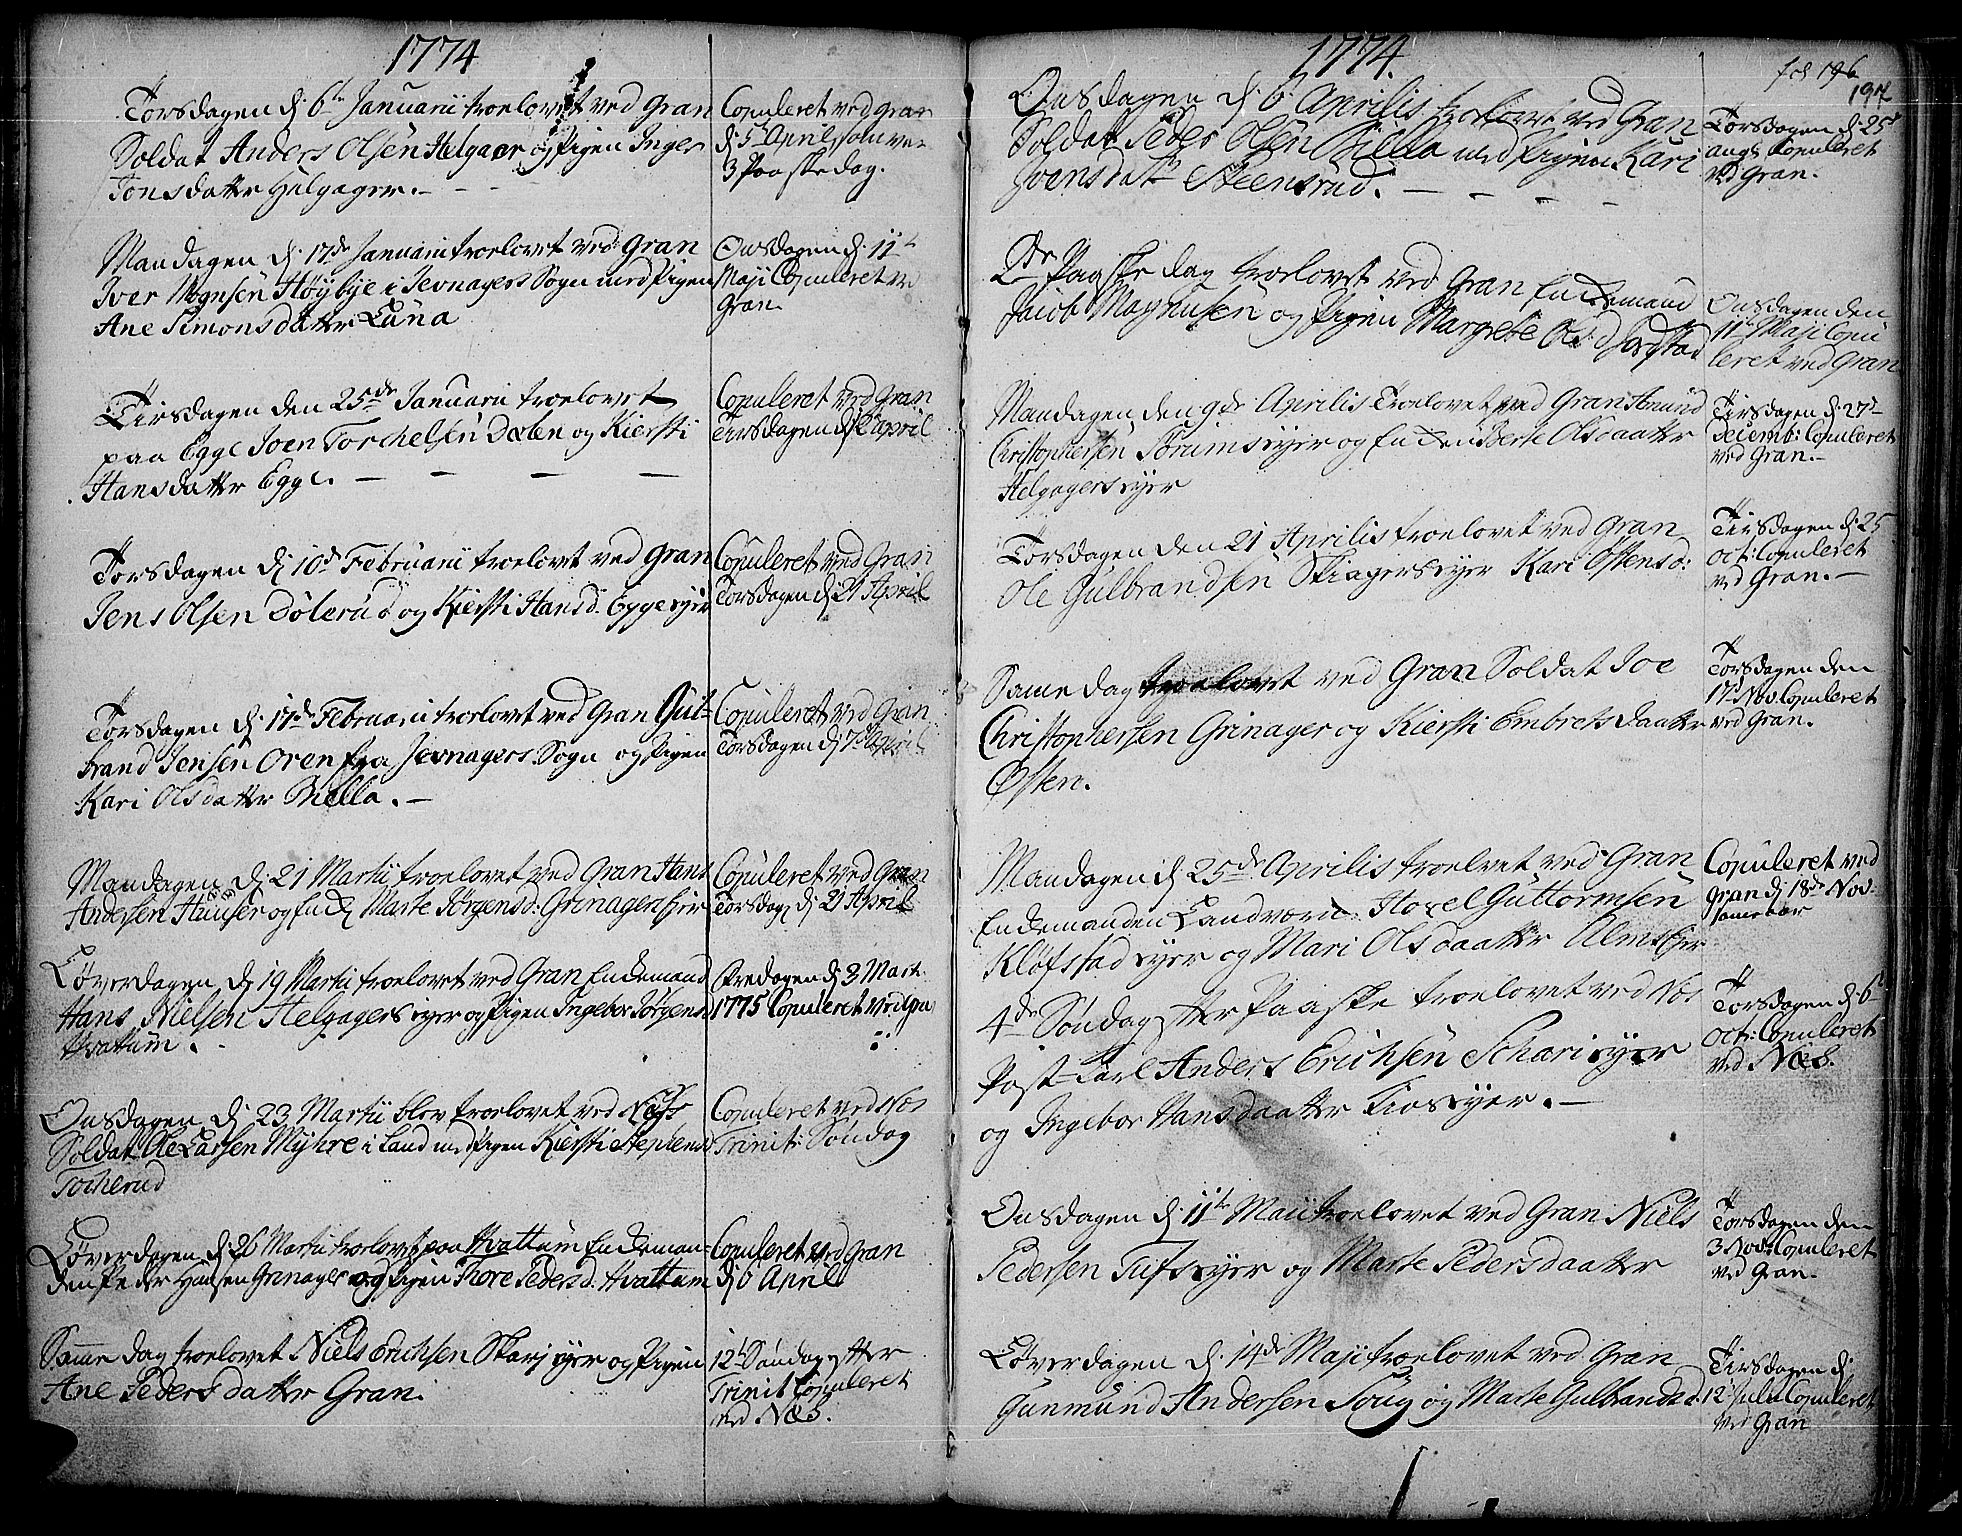 SAH, Gran prestekontor, Ministerialbok nr. 4, 1759-1775, s. 197